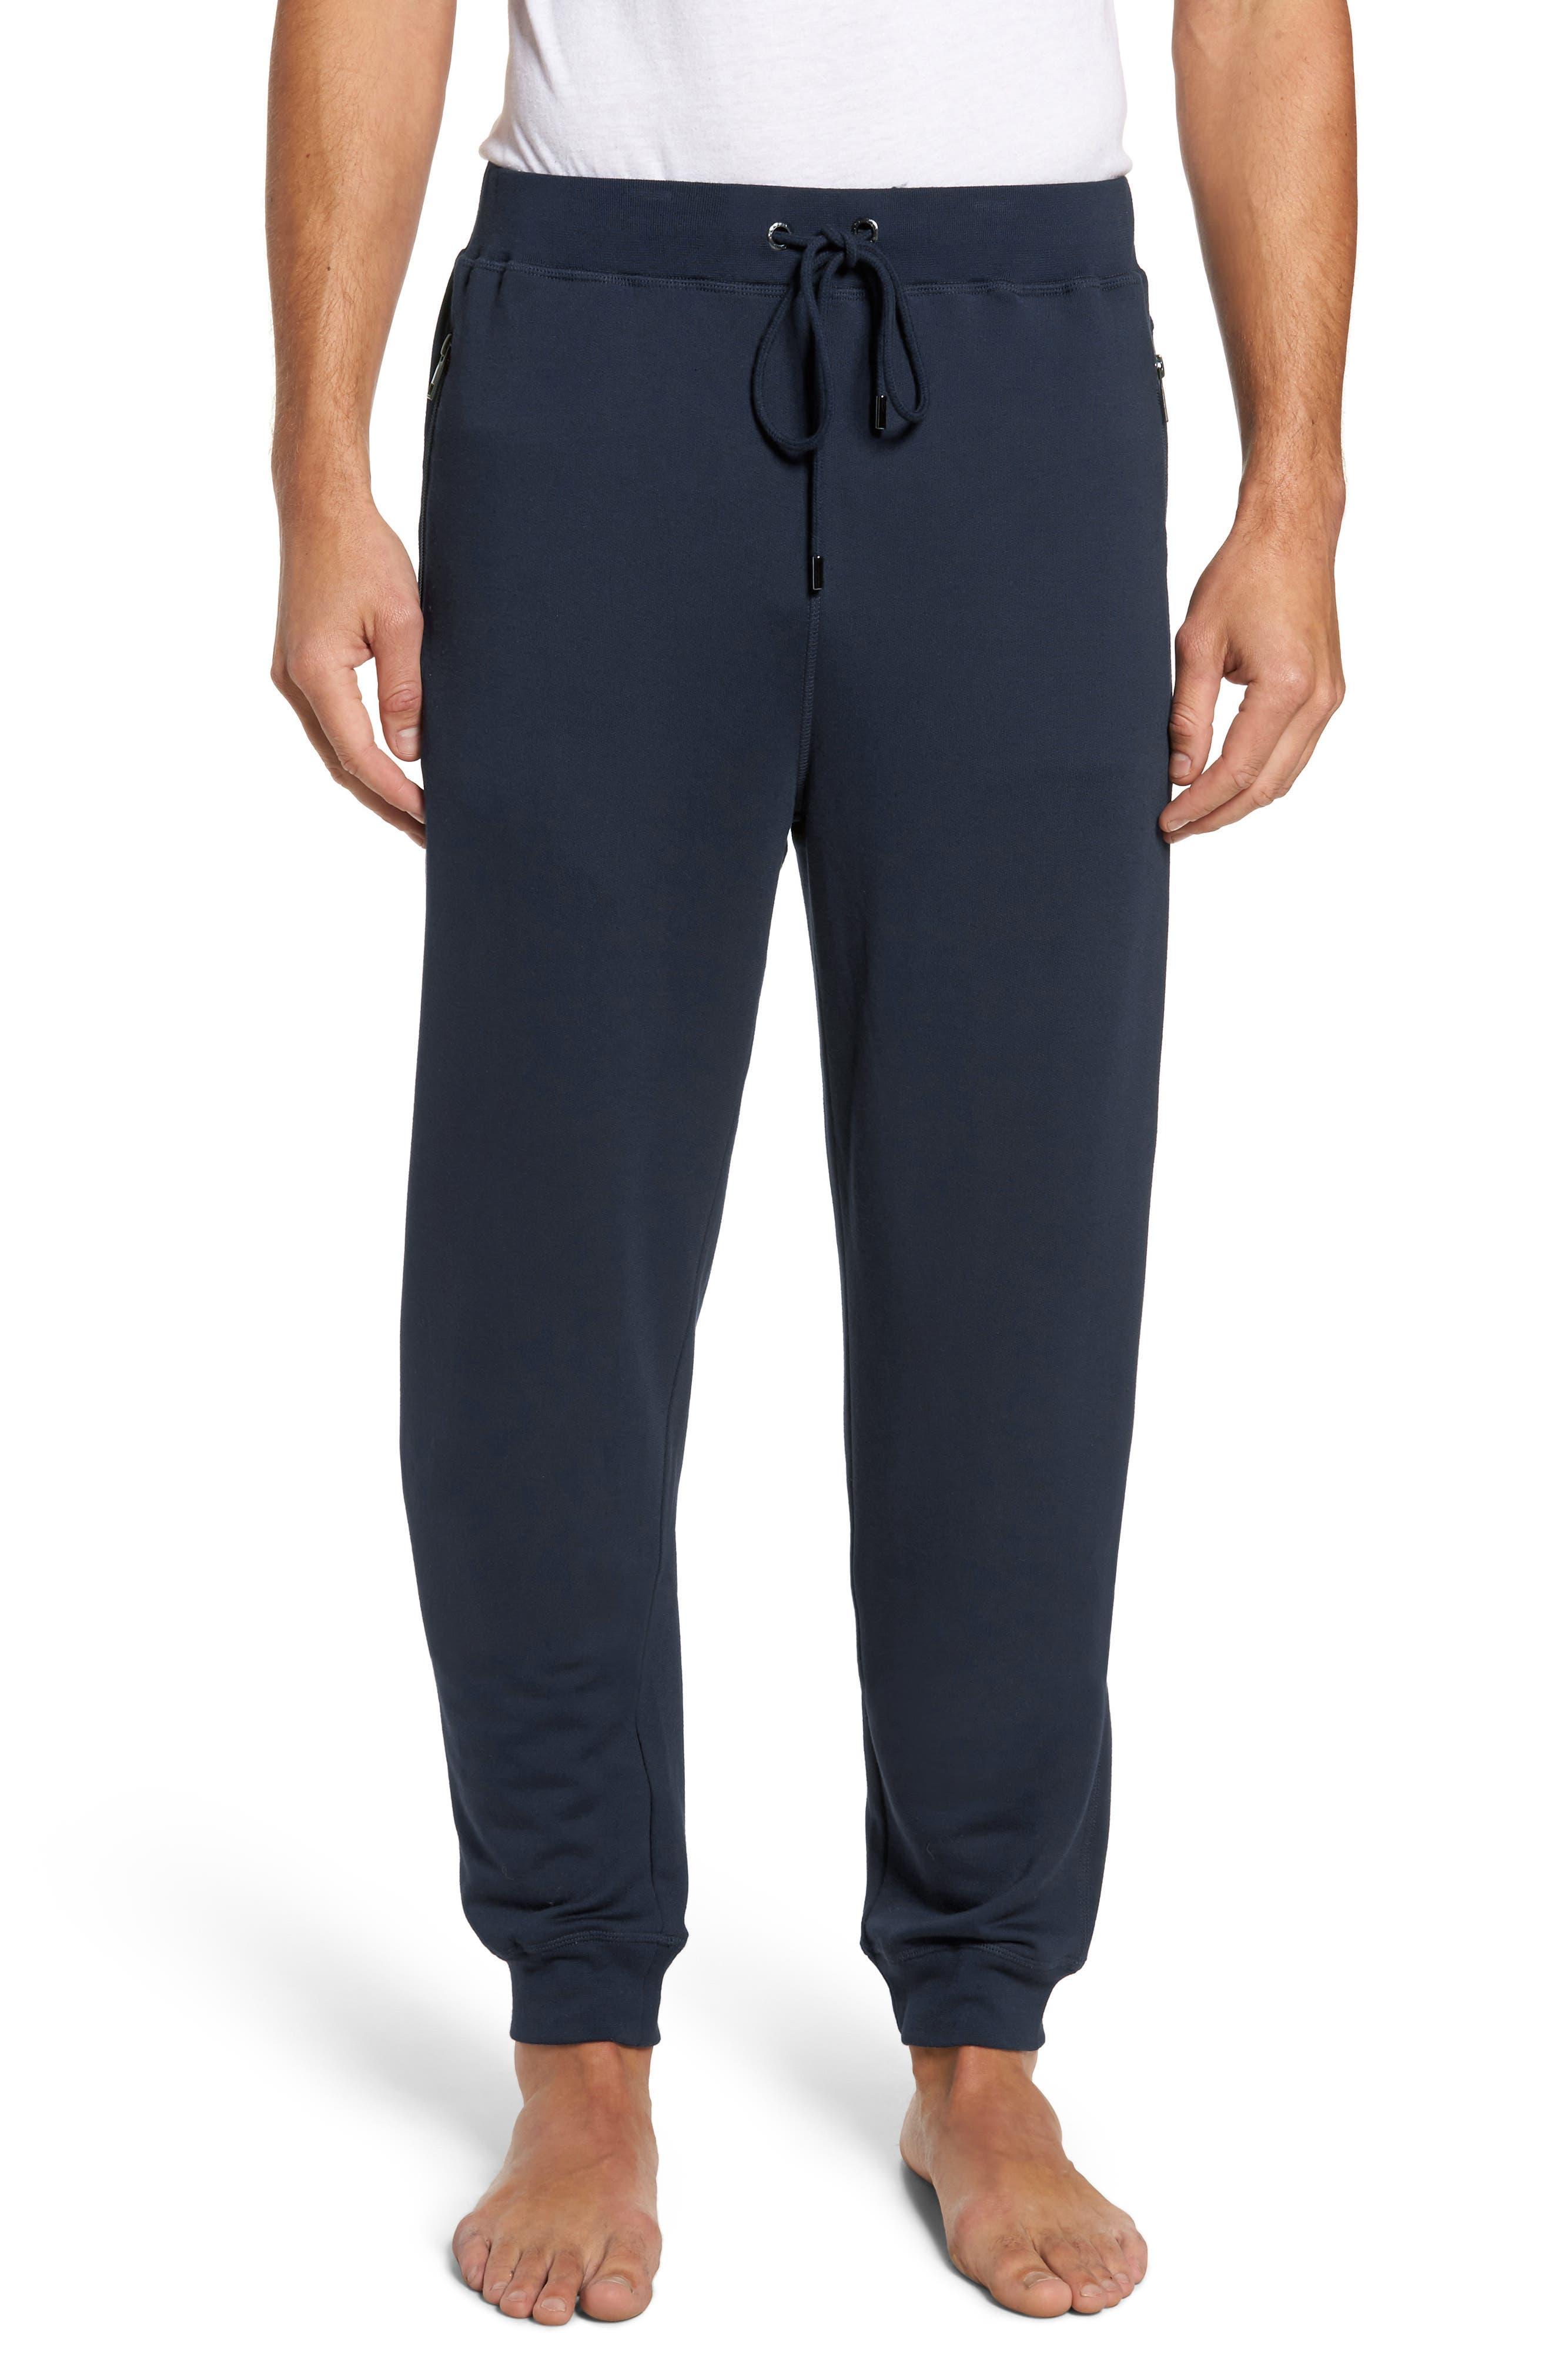 Alternate Image 1 Selected - Daniel Buchler Modal Blend Lounge Pants